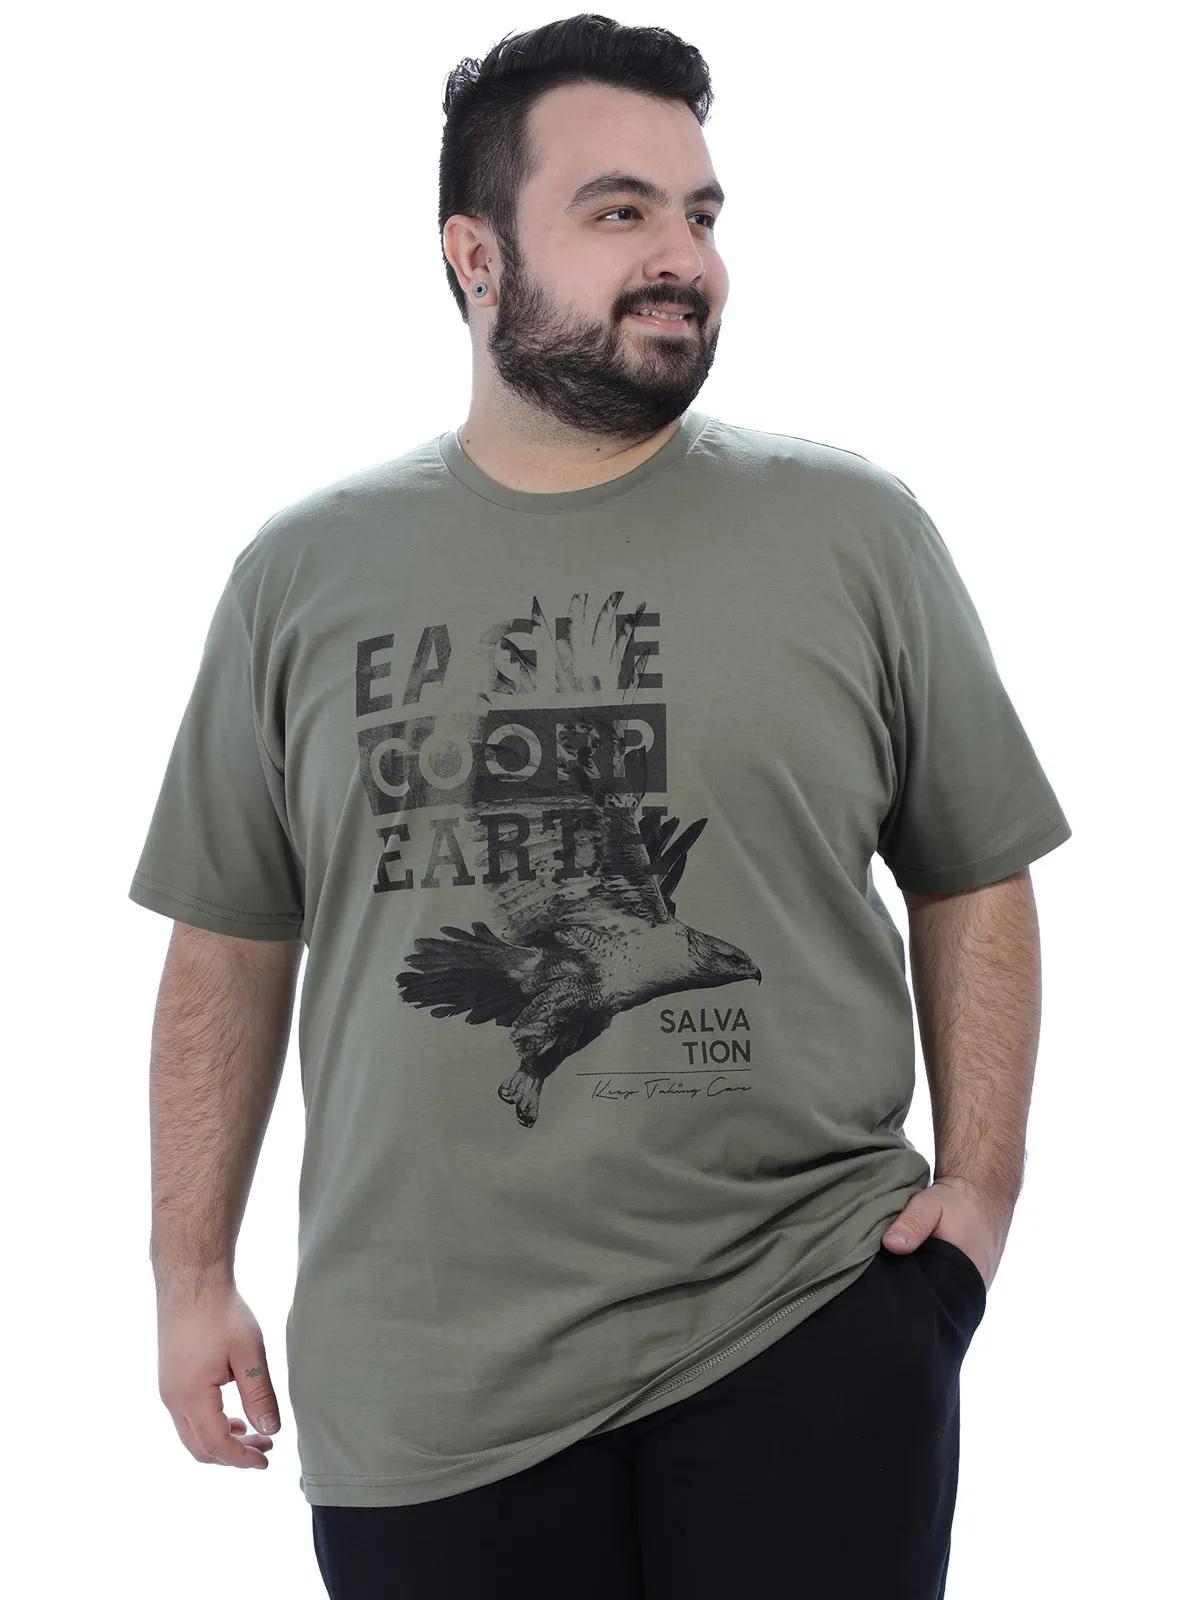 Camiseta Plus Size Masculino Manga Curta Estampada Bambú